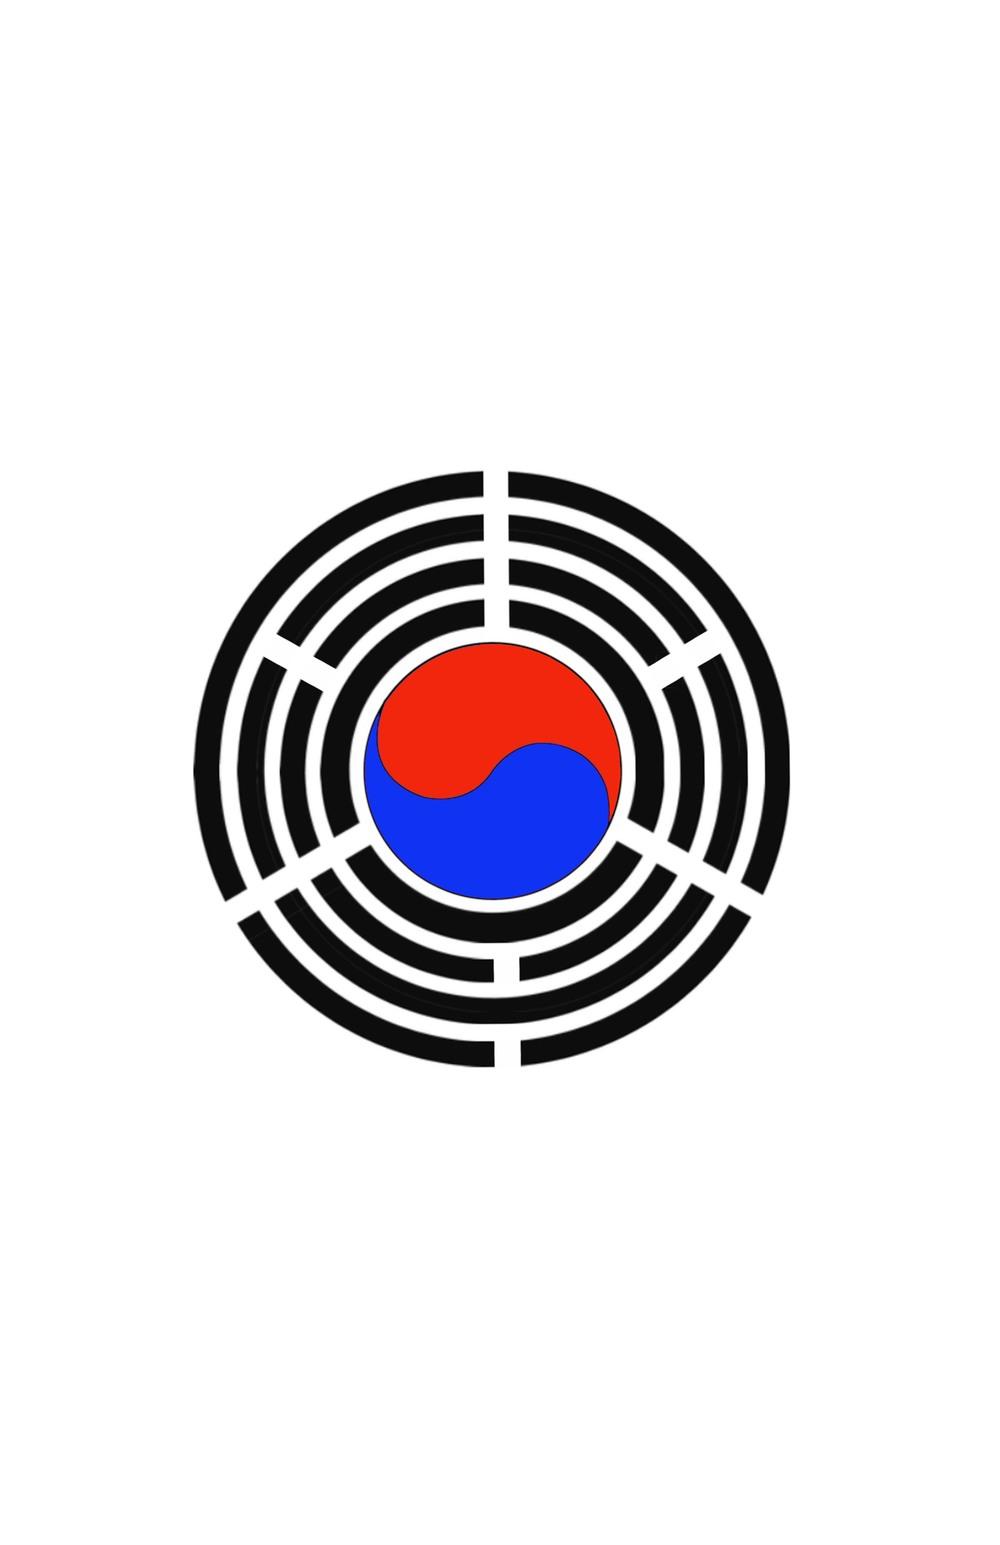 조화[調和] by 장윤희 Yunhee Chang